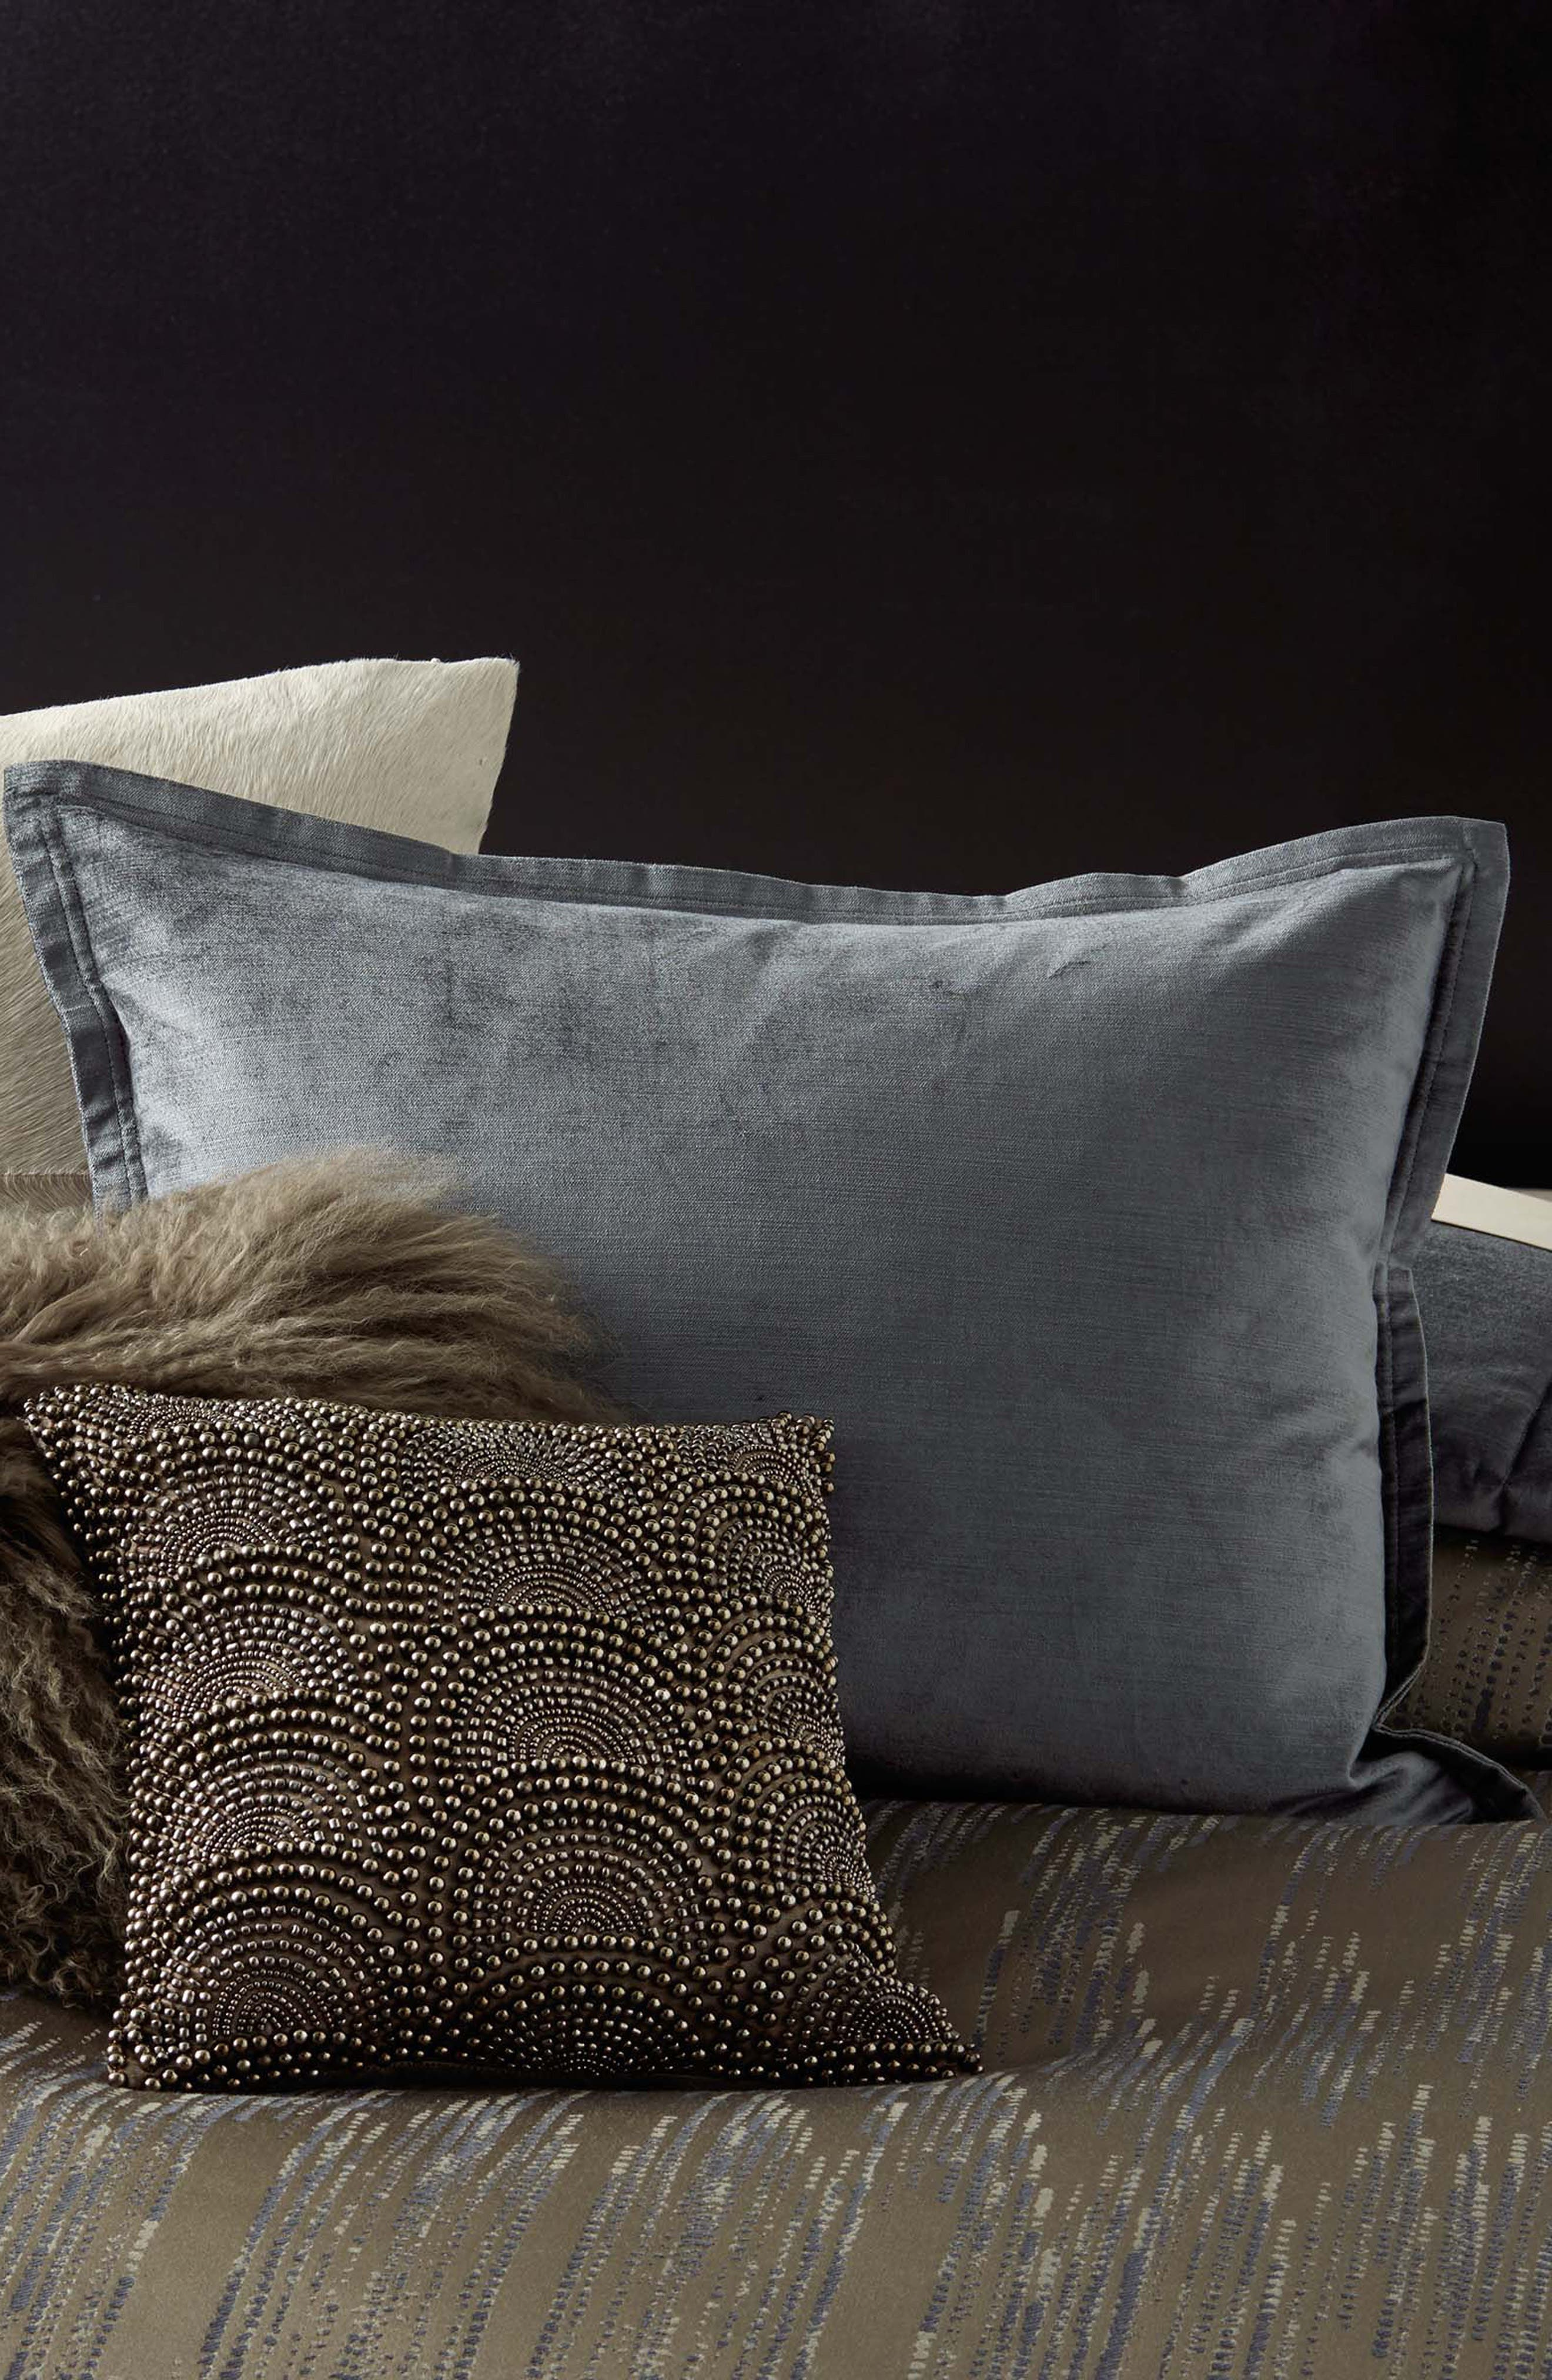 DONNA KARAN NEW YORK, Exhale Flokati Genuine Sheepskin Pillow, Main thumbnail 1, color, TAUPE